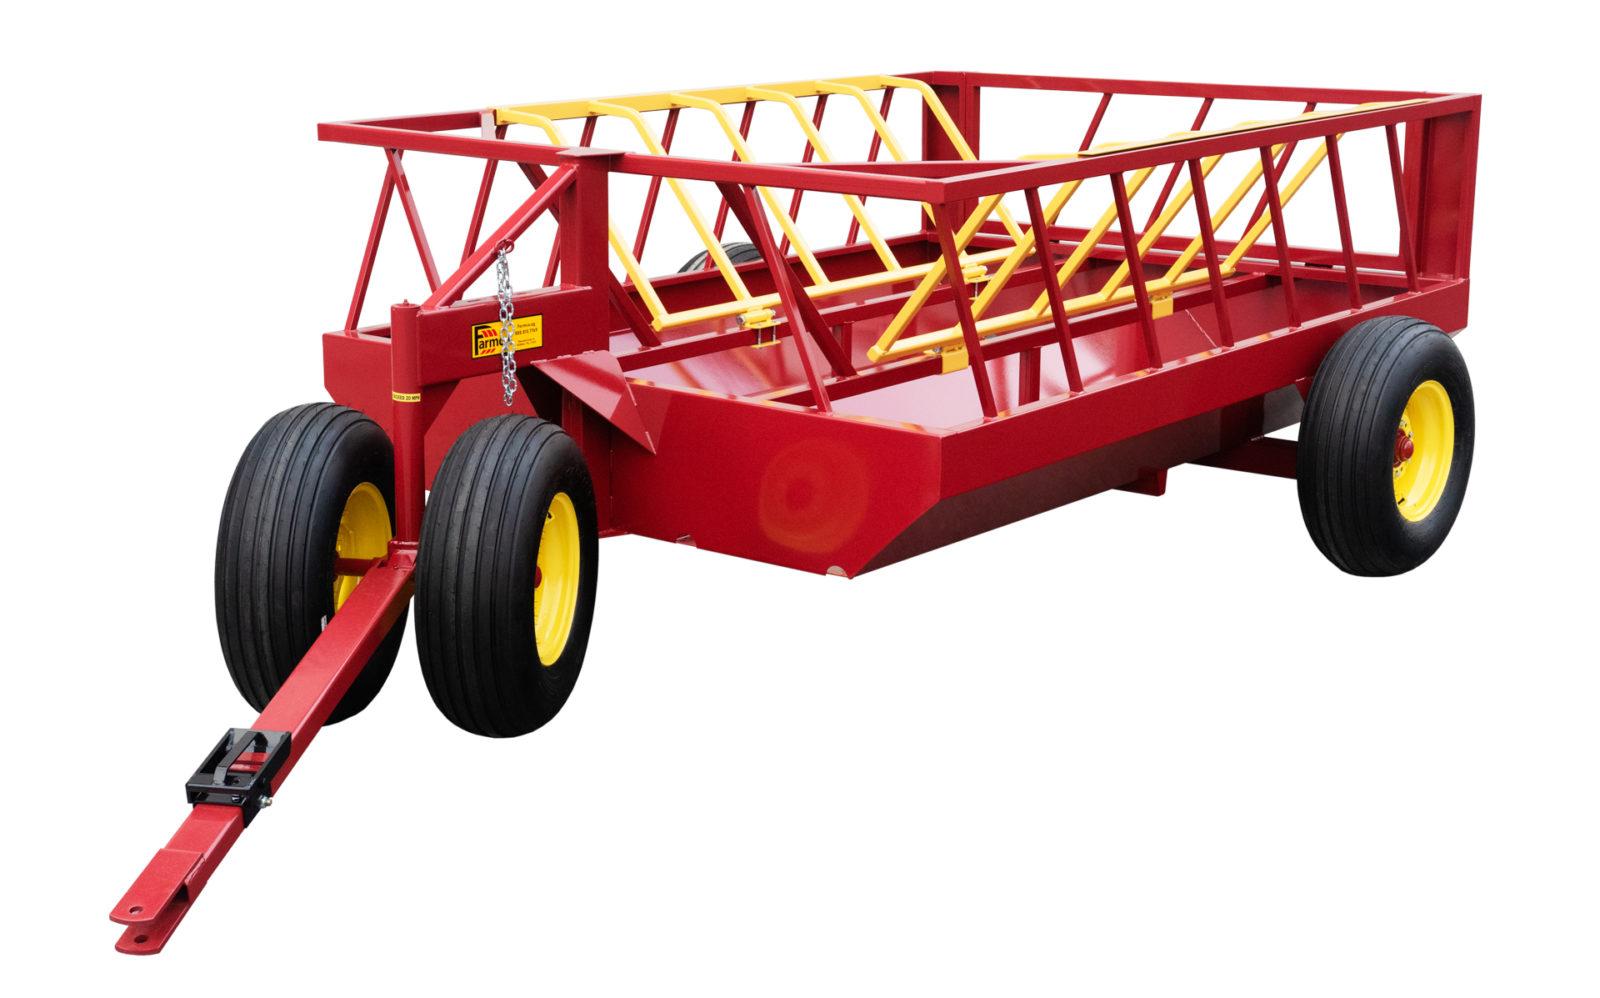 cattle hay feeder on wheels